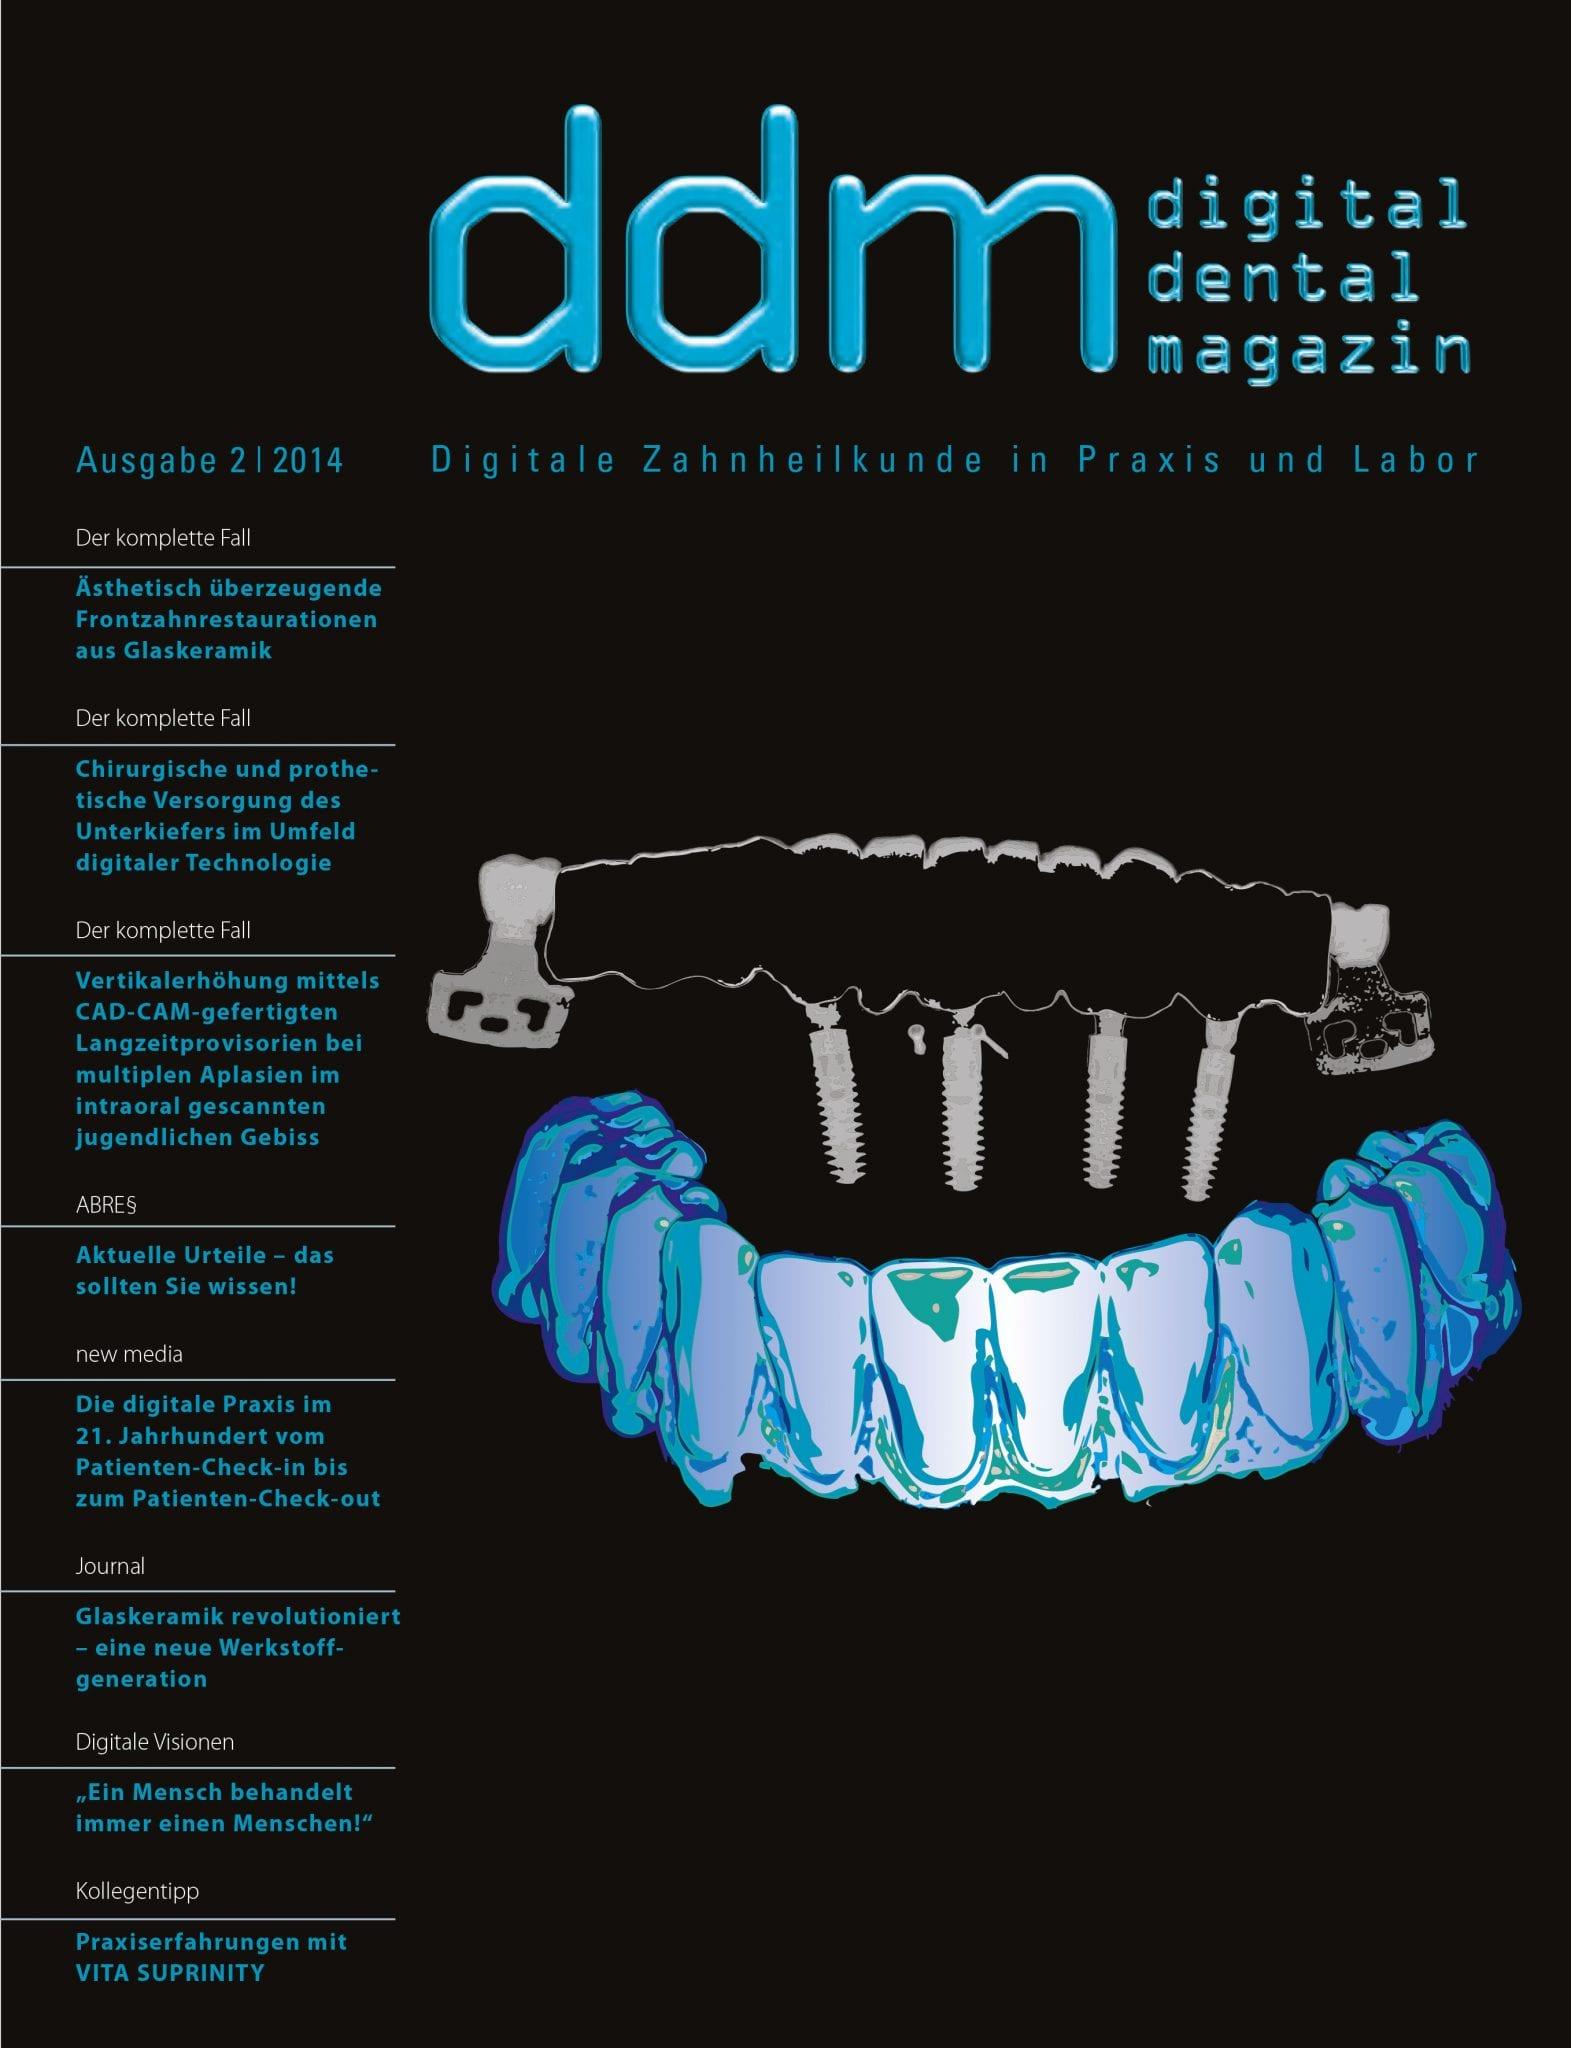 Deckblat-digital-dental-magazin-02_2014 Deckblatt